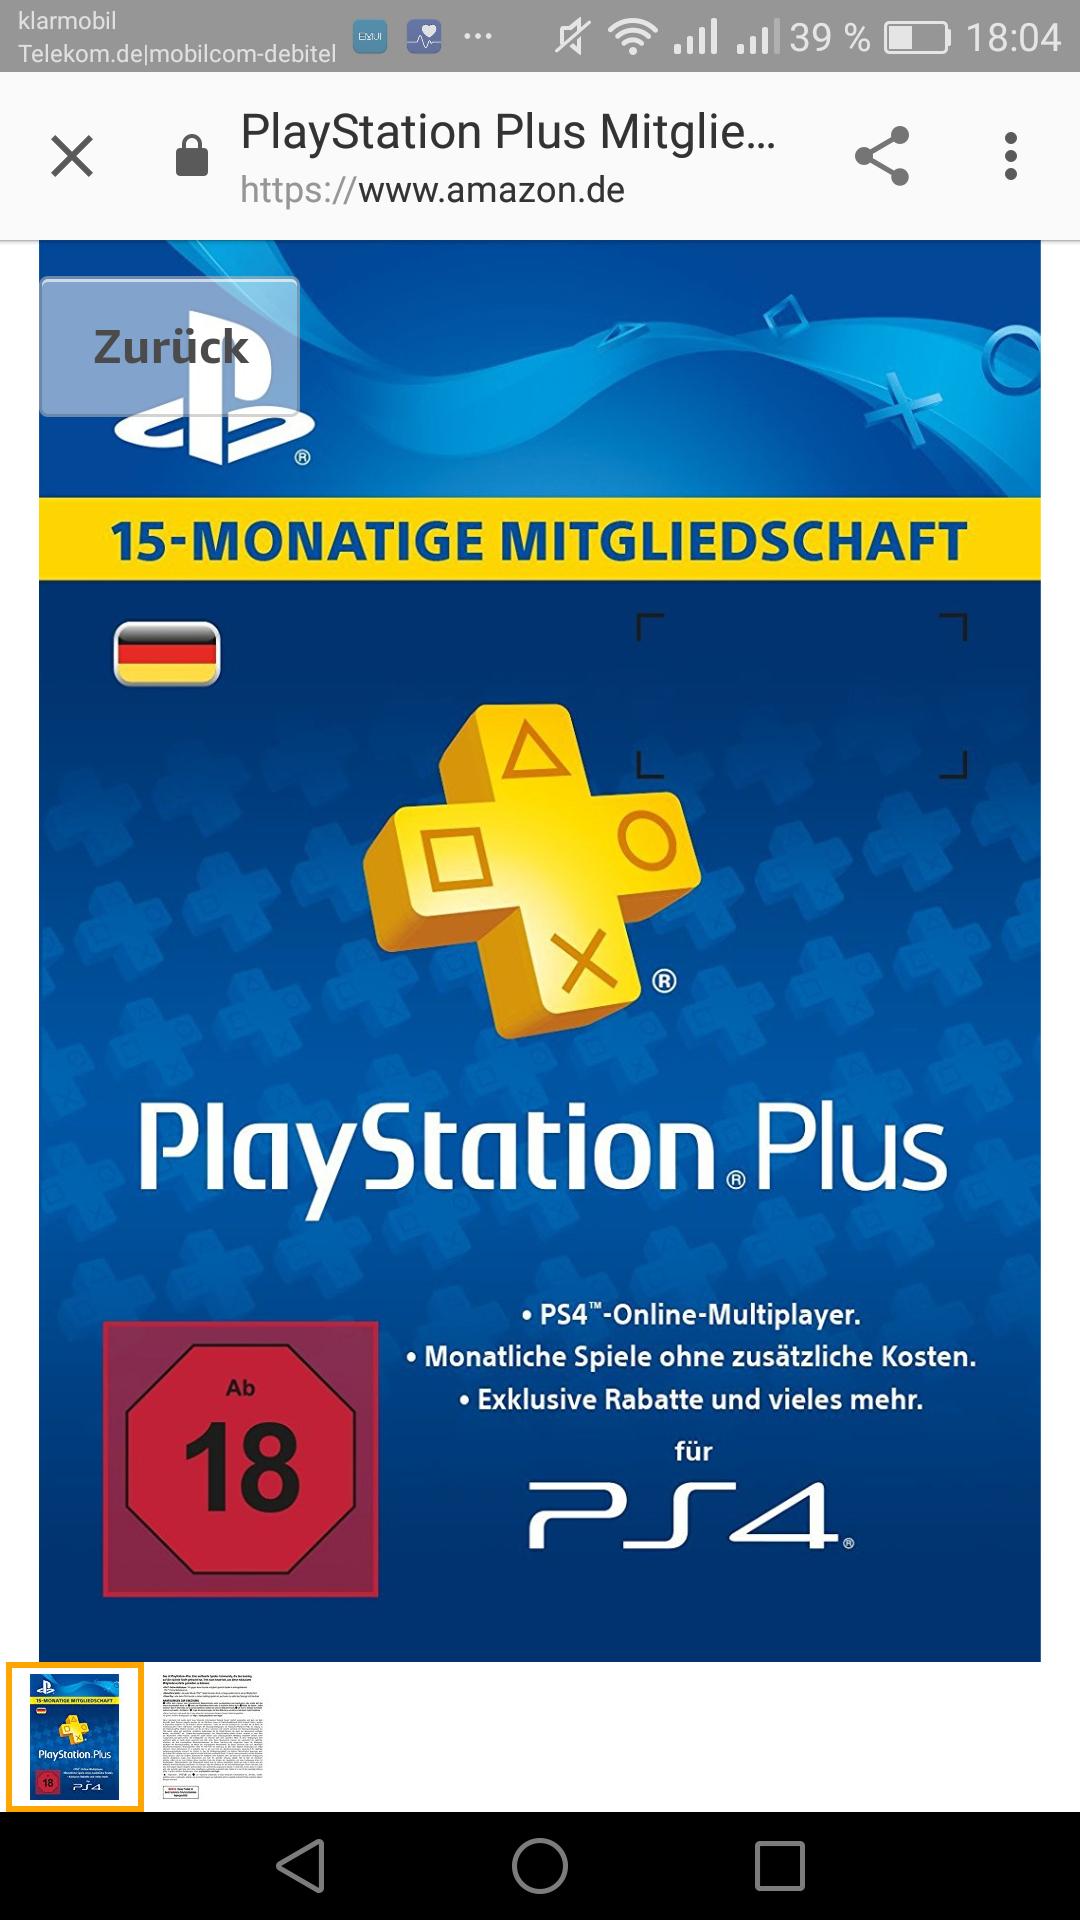 PlayStation Plus Mitgliedschaft 15 Monate [Amazon Prime Day]